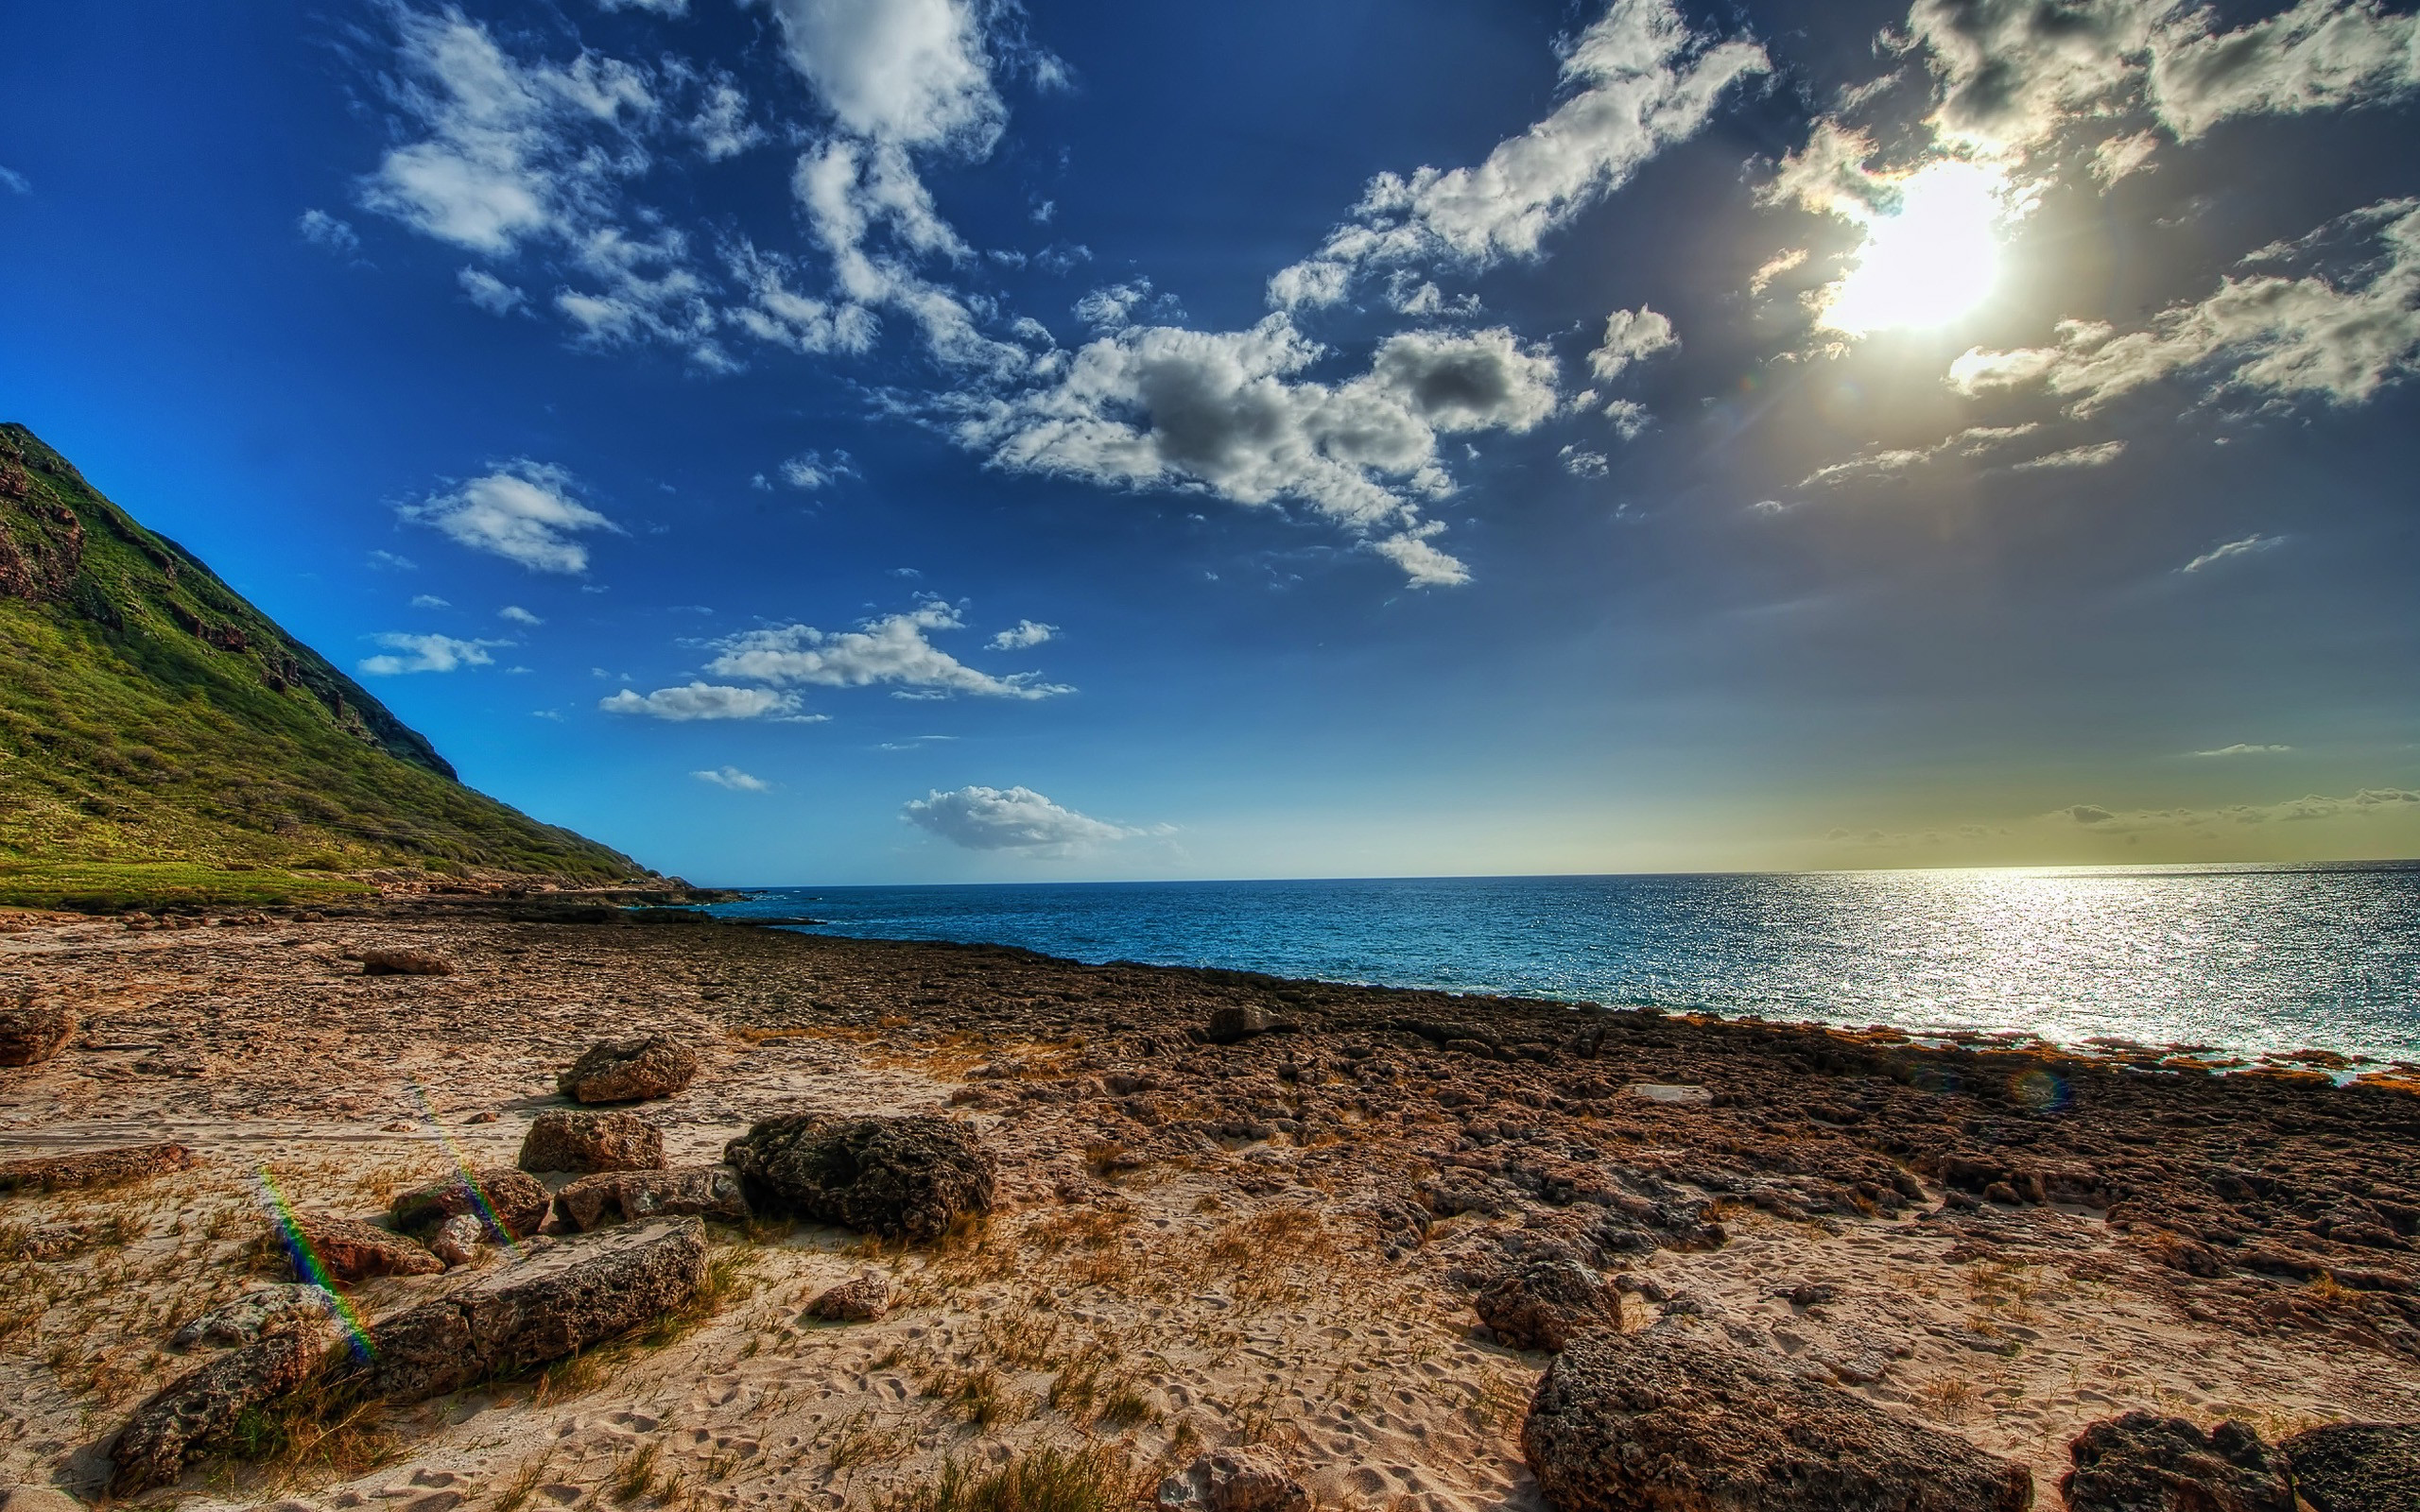 scenery ocean sea